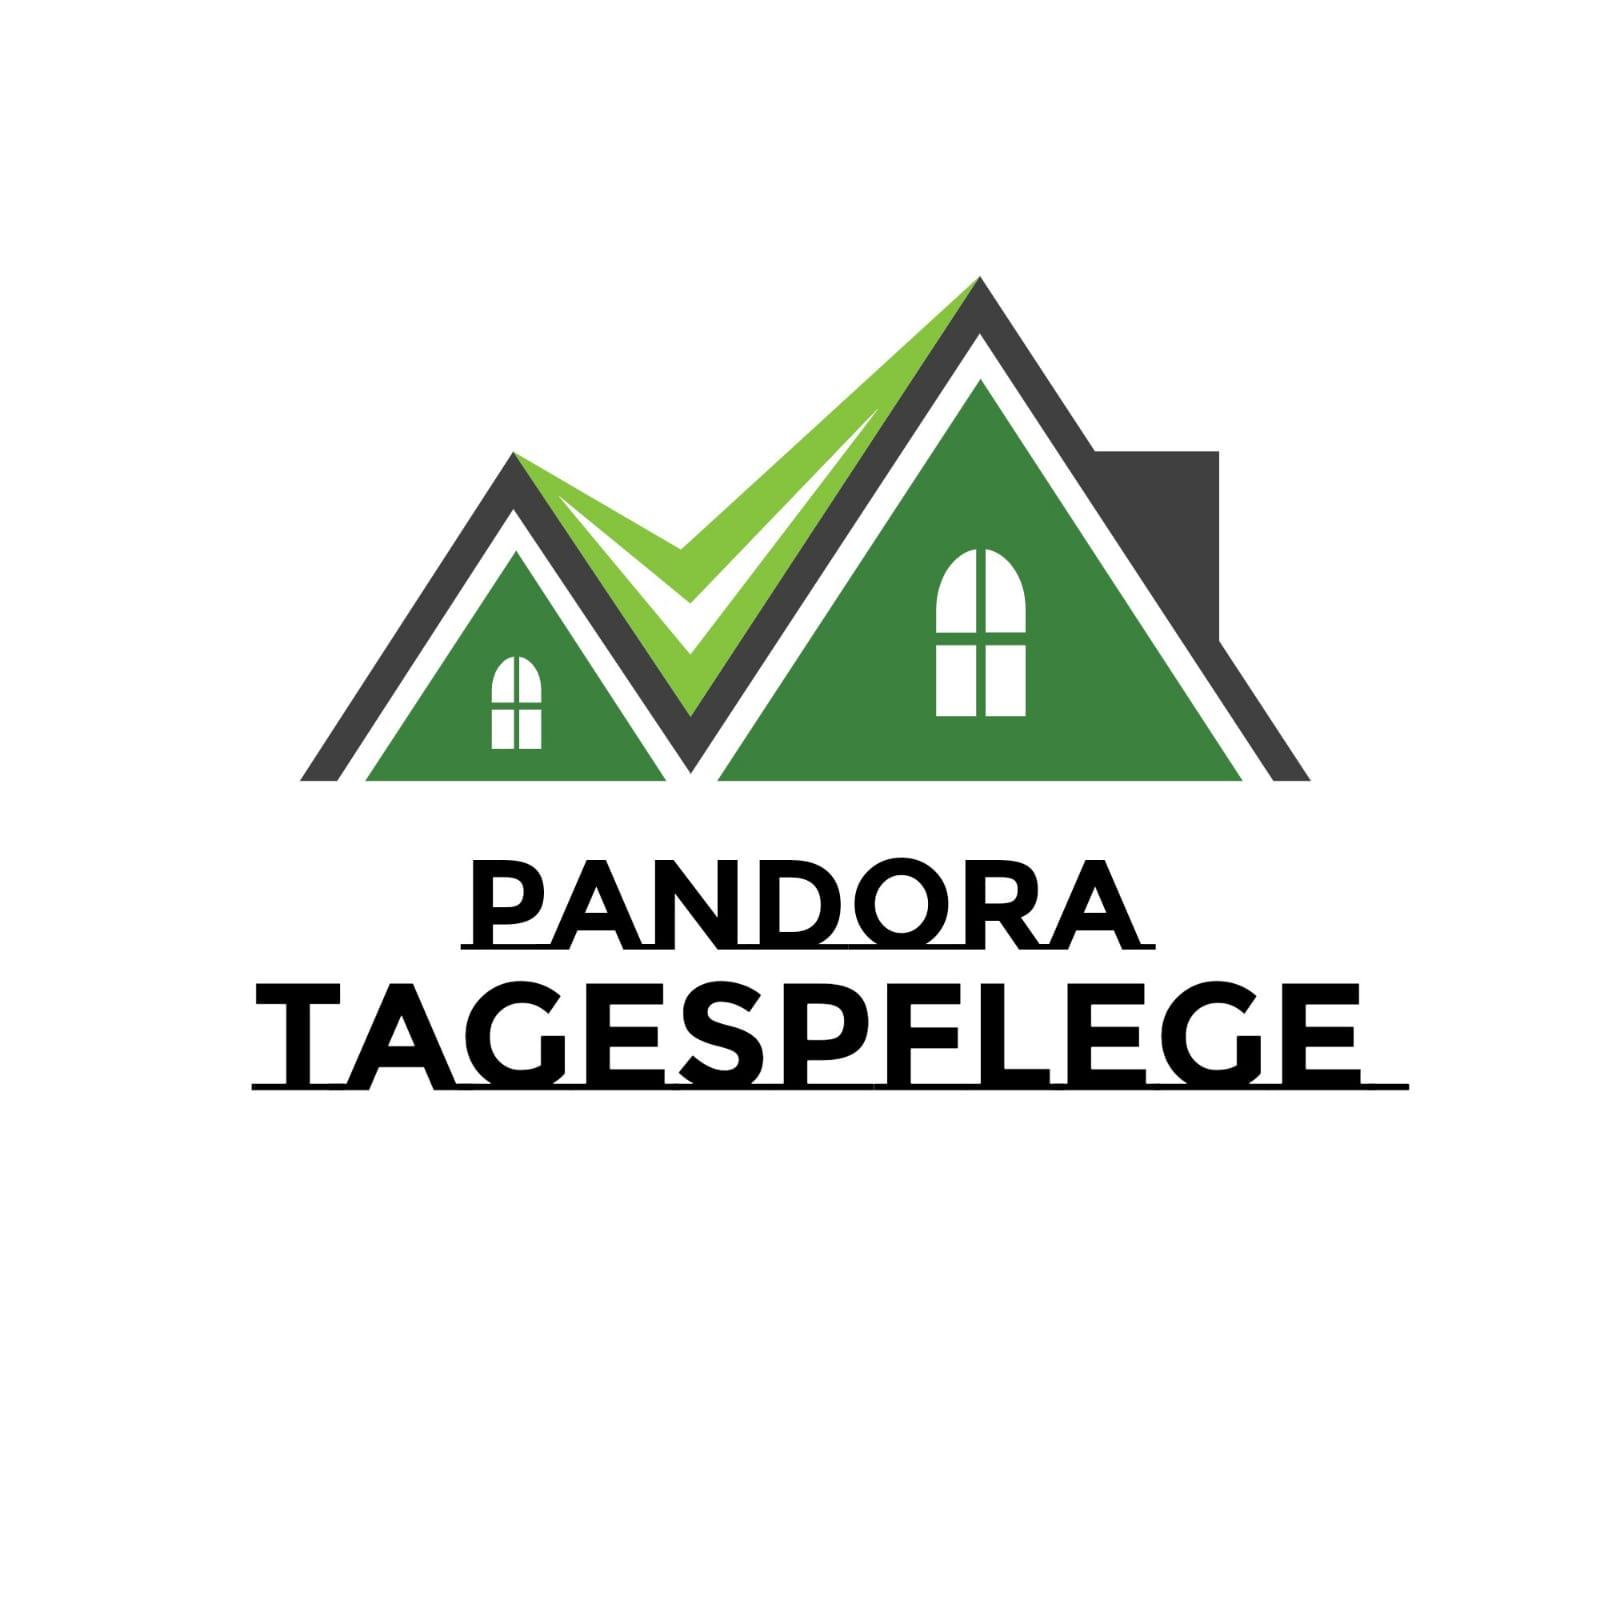 Pandora Tagespflege